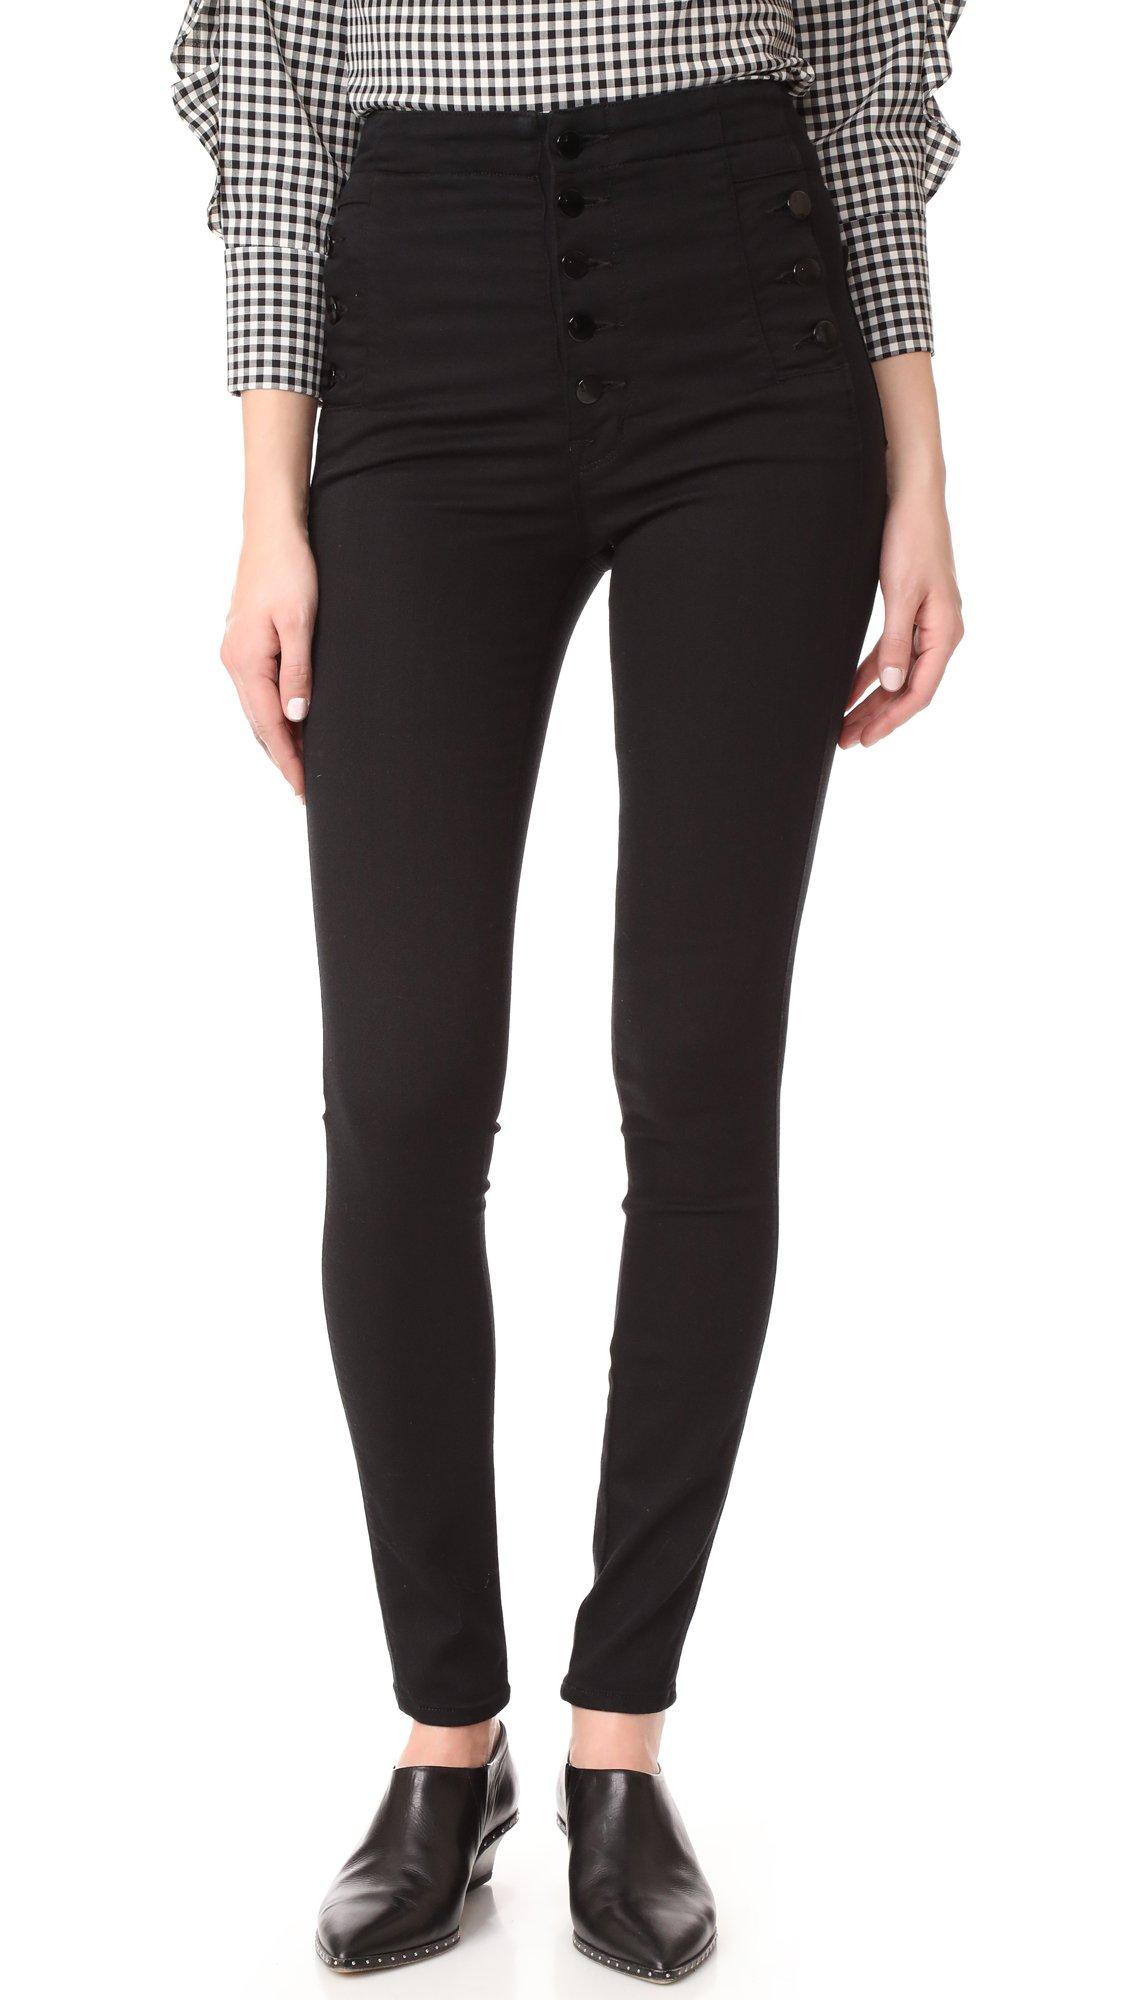 J Brand Jeans Women's Natasha Sky High Rise Skinny, Seriously Black, 27